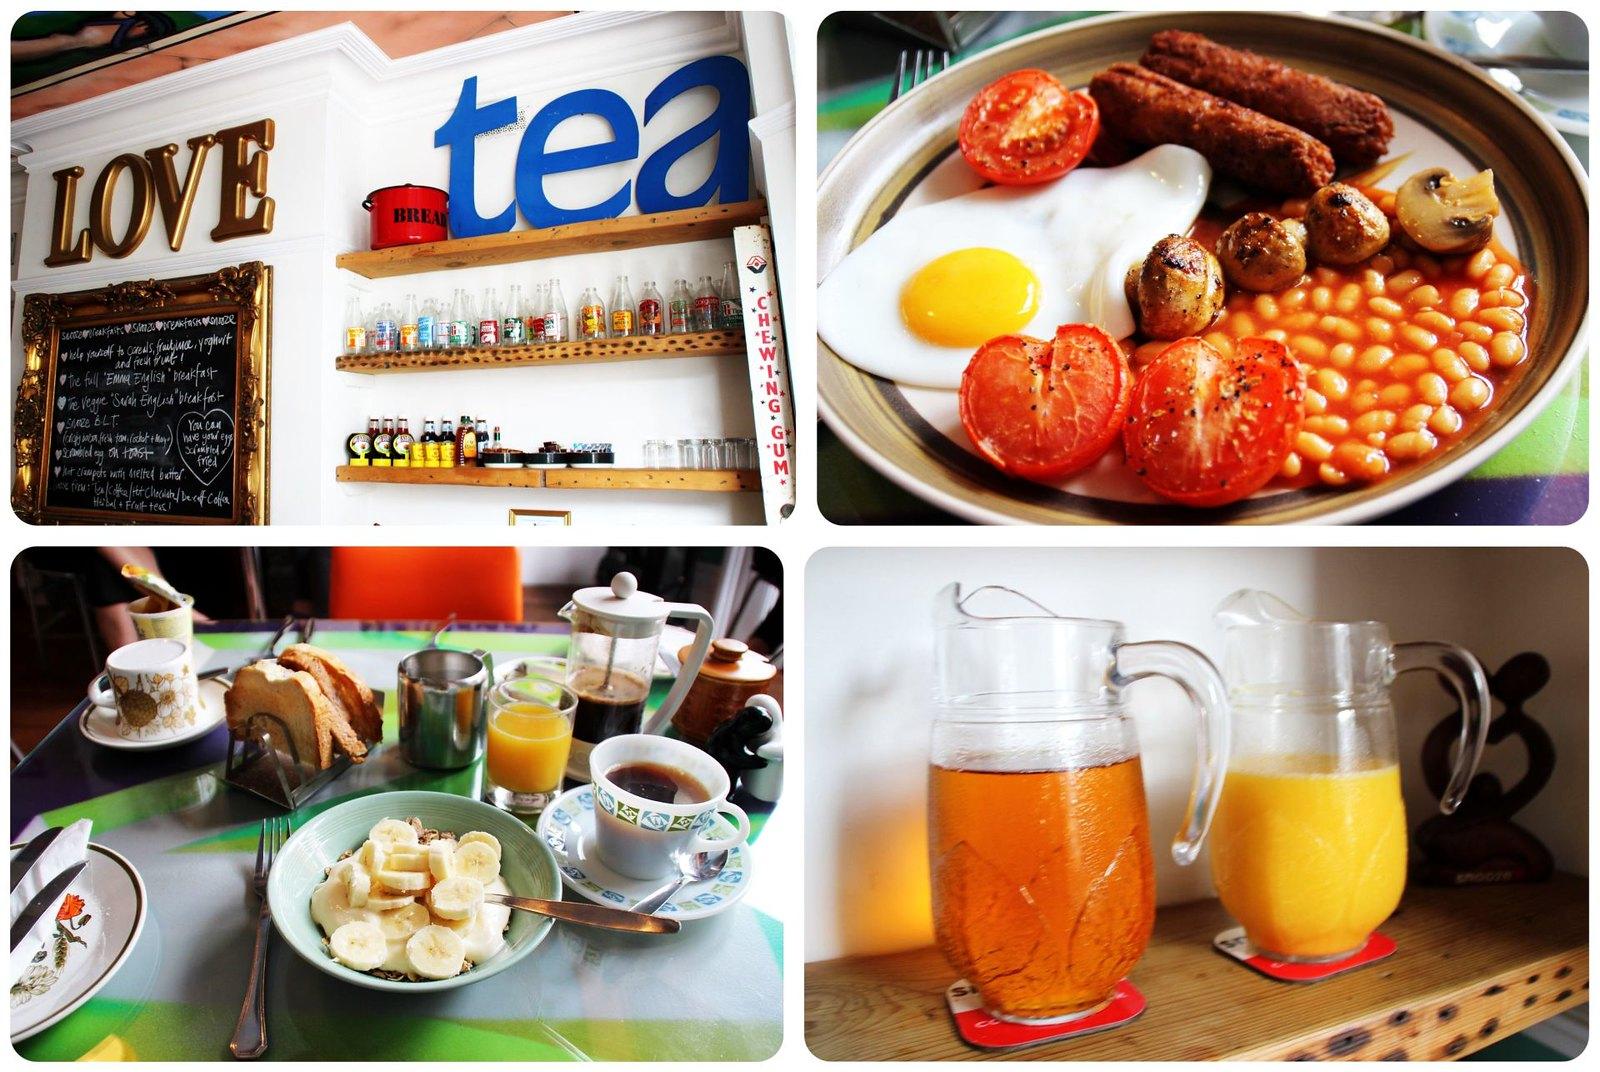 Brighton Snooze B&B breakfast